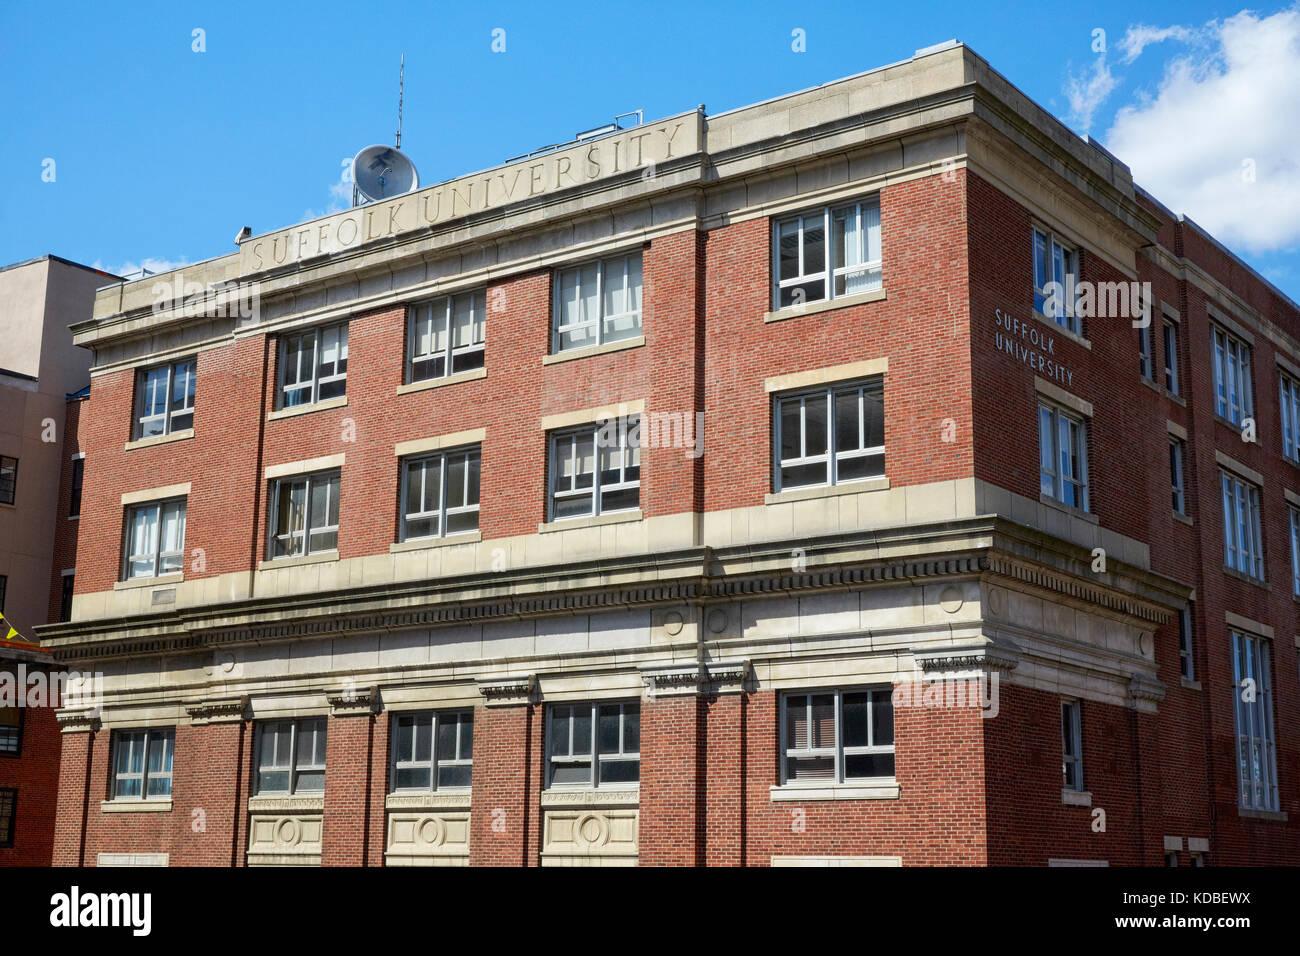 Suffolk University, Boston, Massachusetts, EE.UU. Imagen De Stock